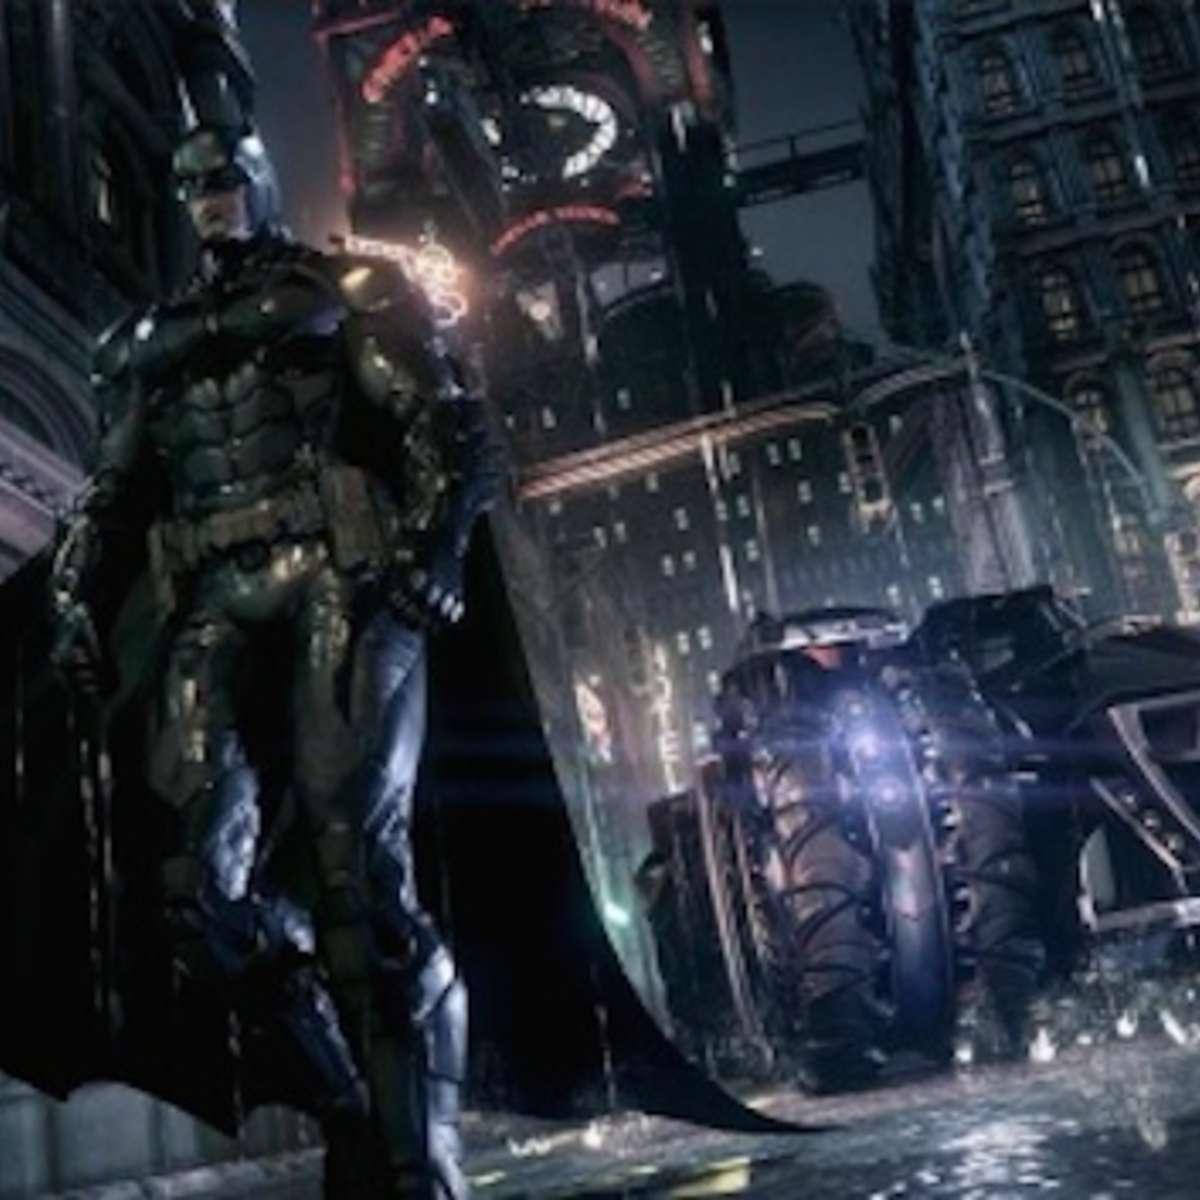 news_batman_arkham_knight_gameplay-16086.jpg